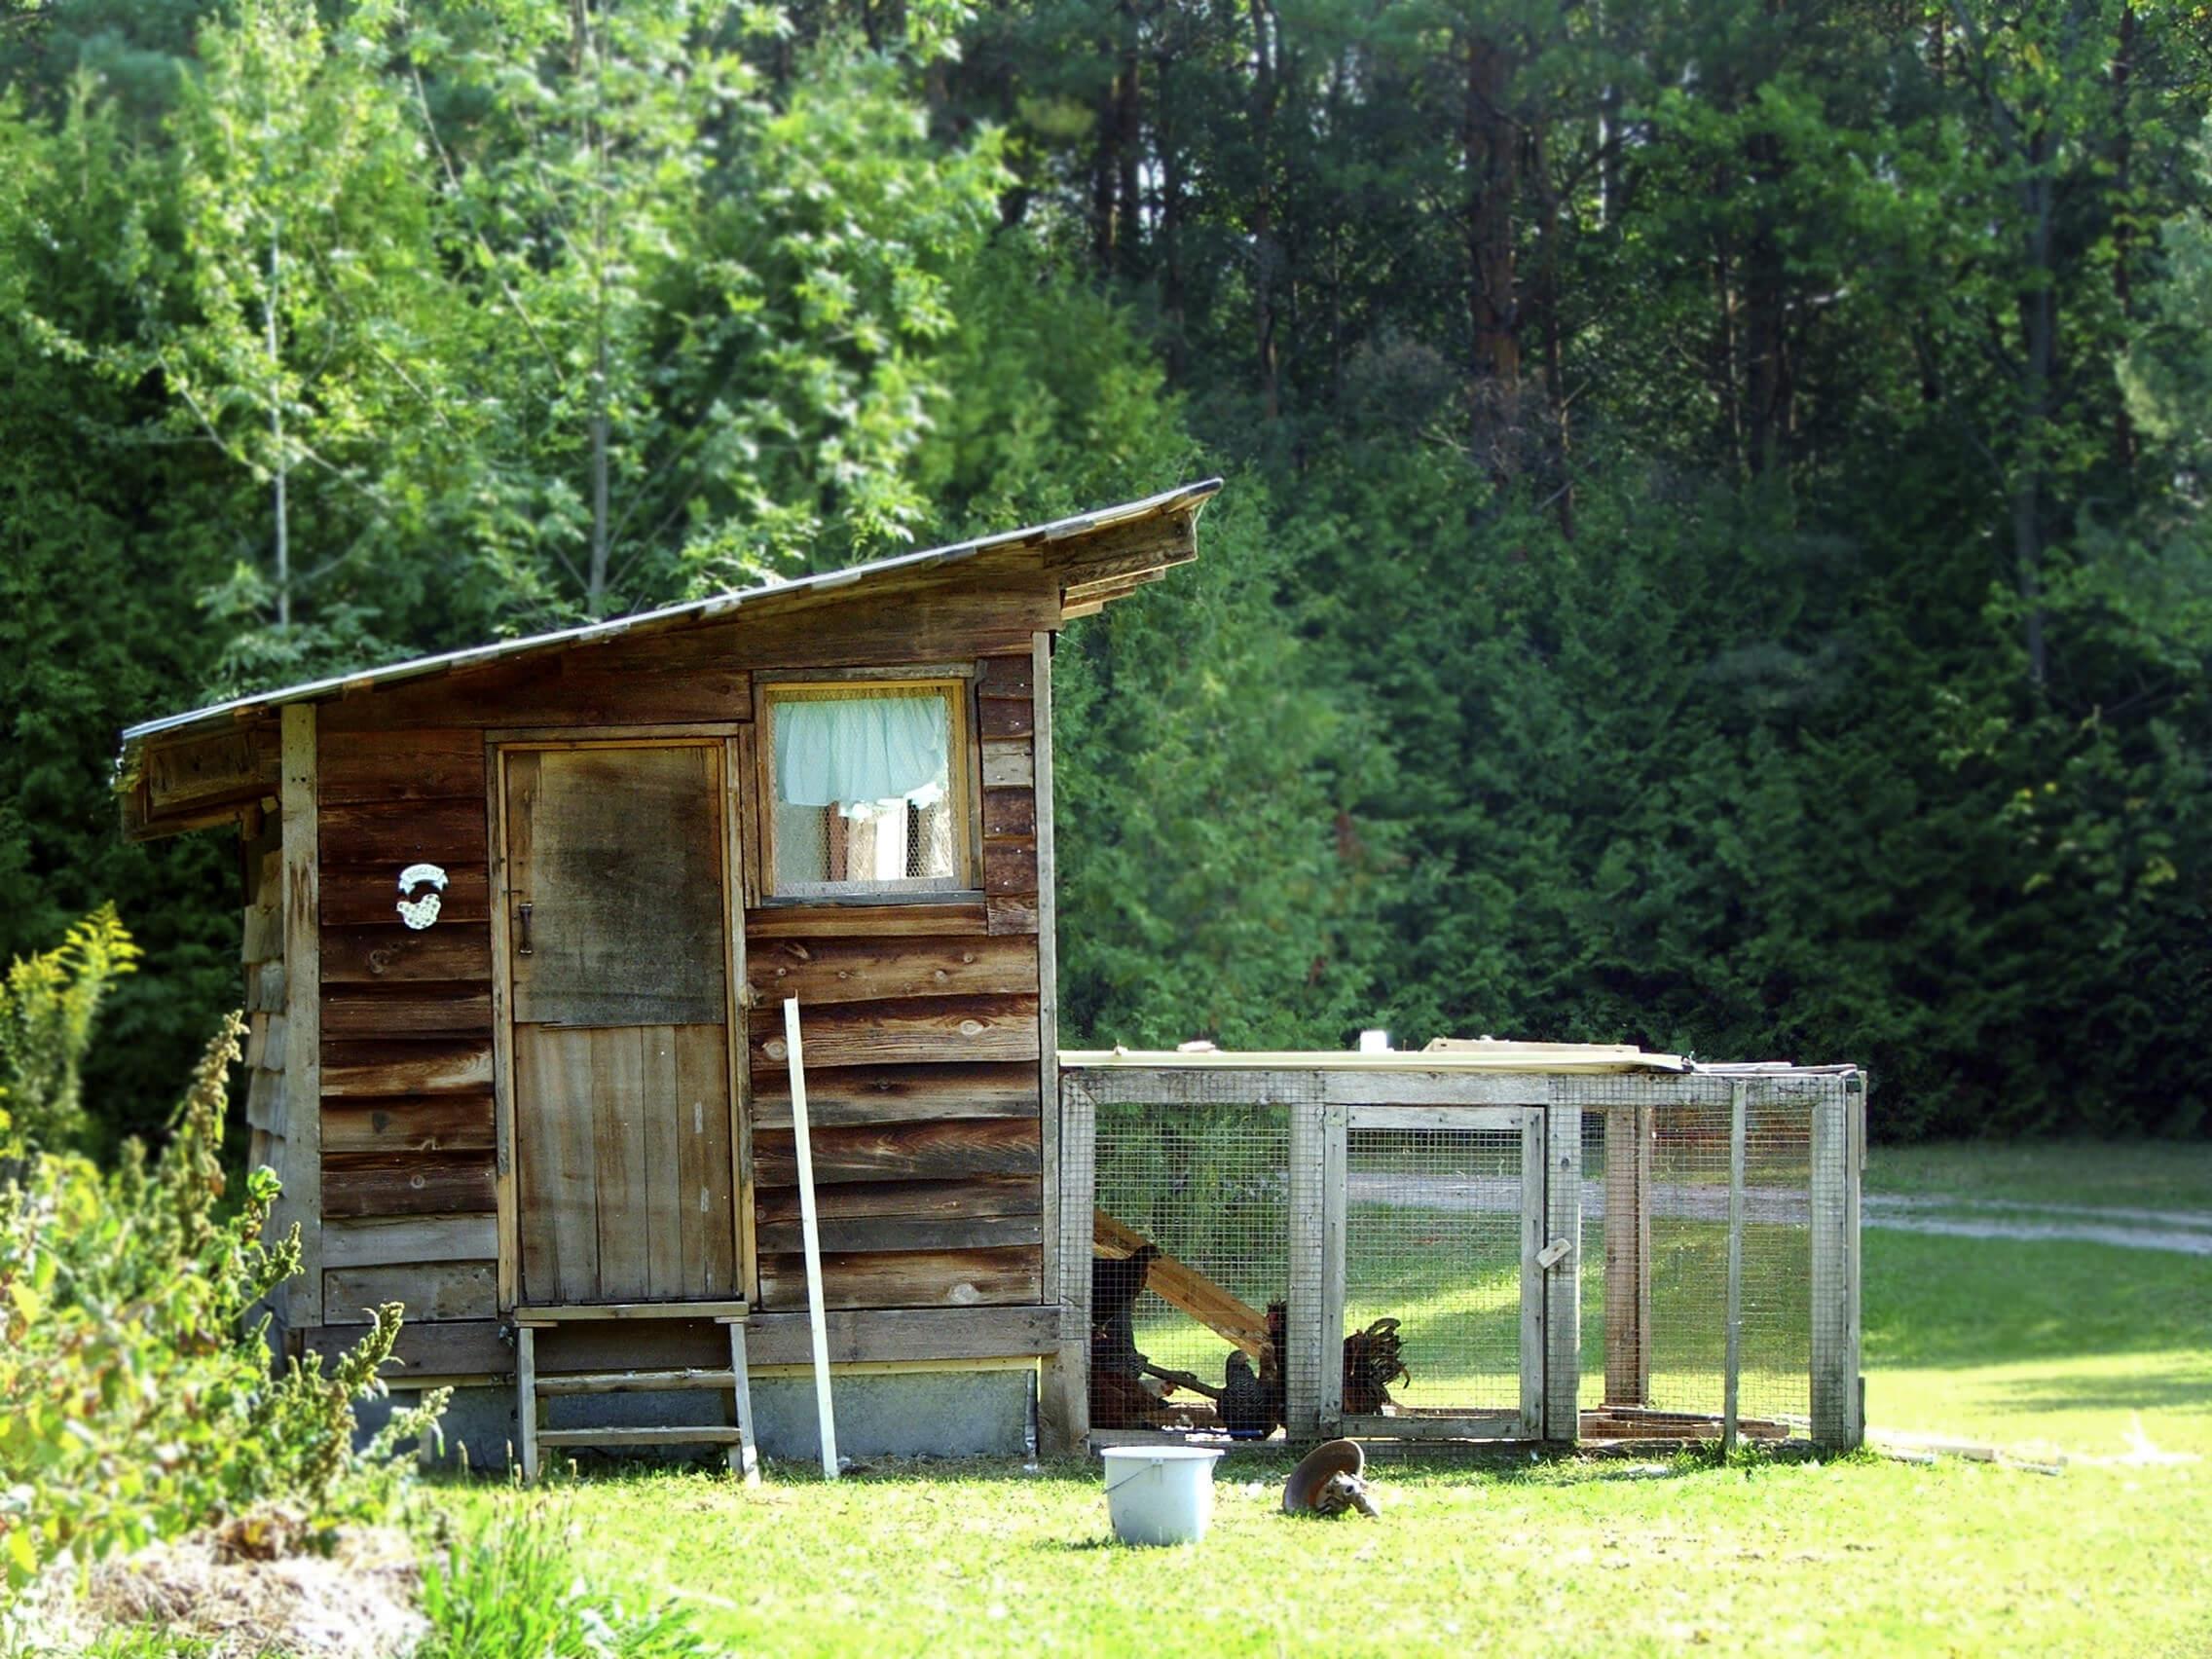 35 Backyard Chicken Coop Ideas